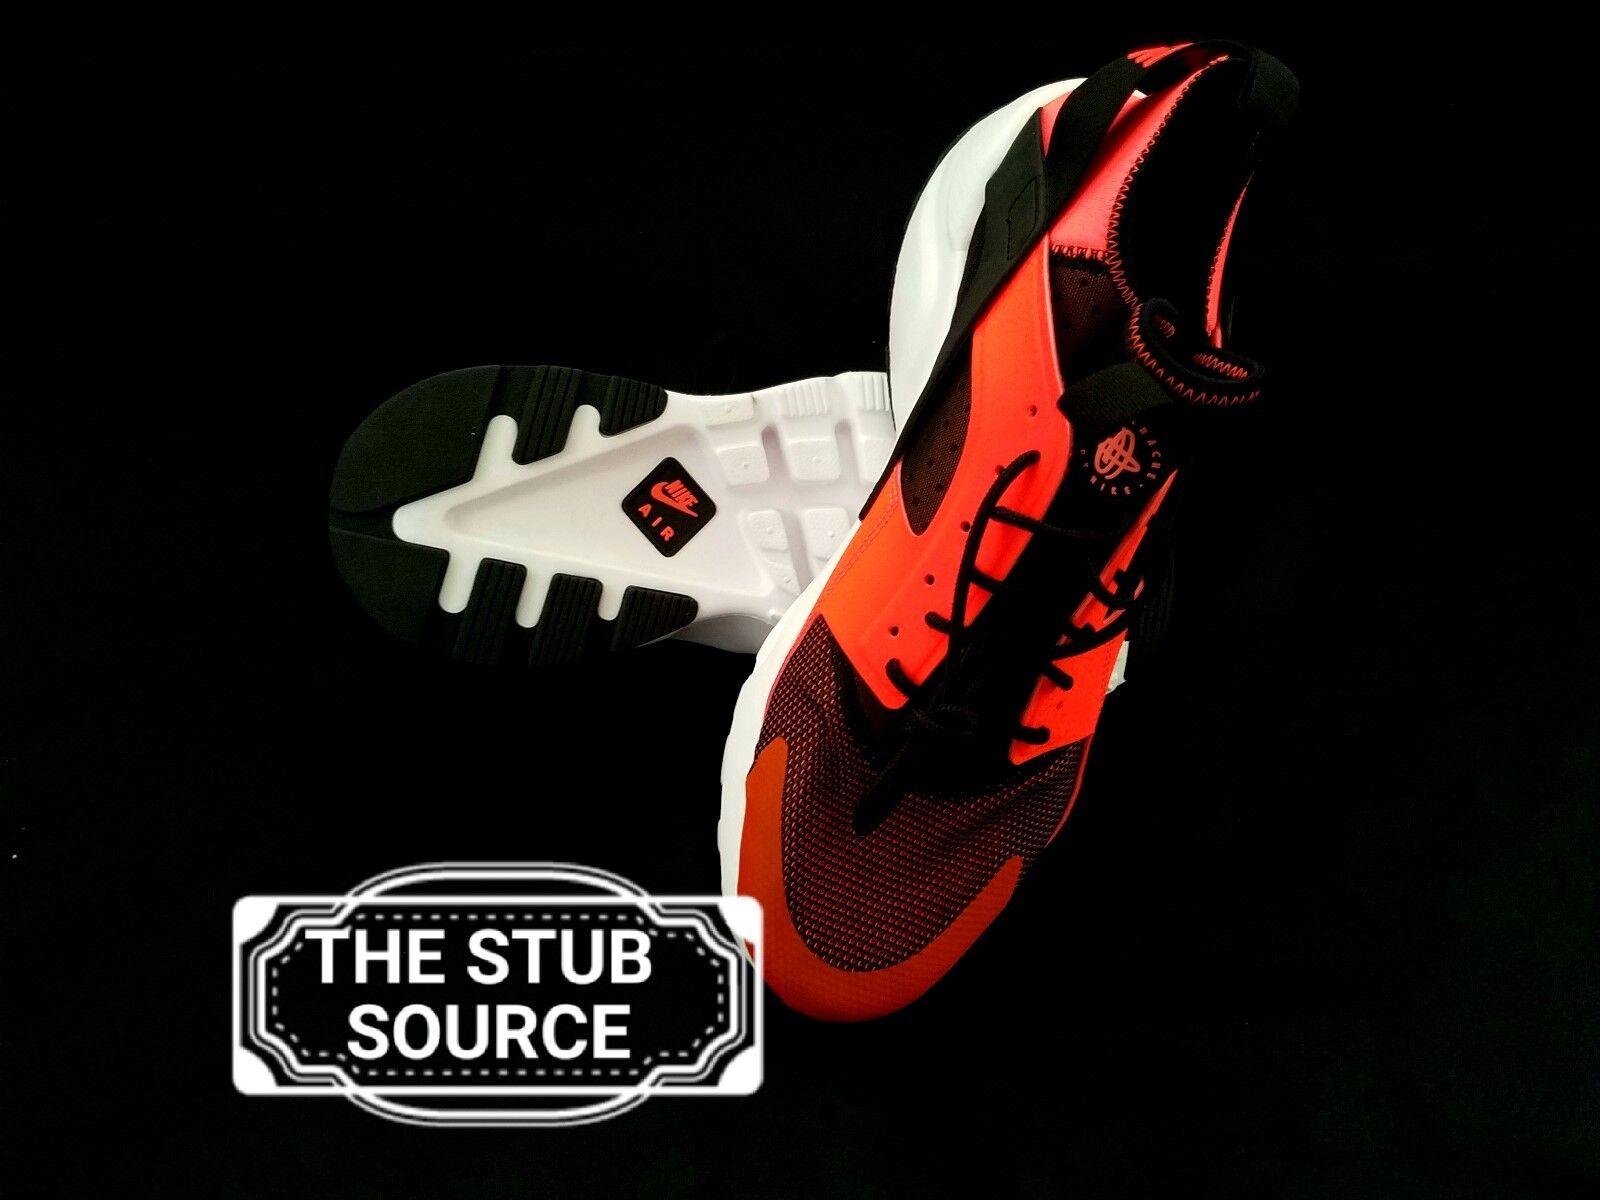 Nike Air Huarache Run Ultra Crimson Orange Shoes Sneakers Sz 13 819685-008 NWOB